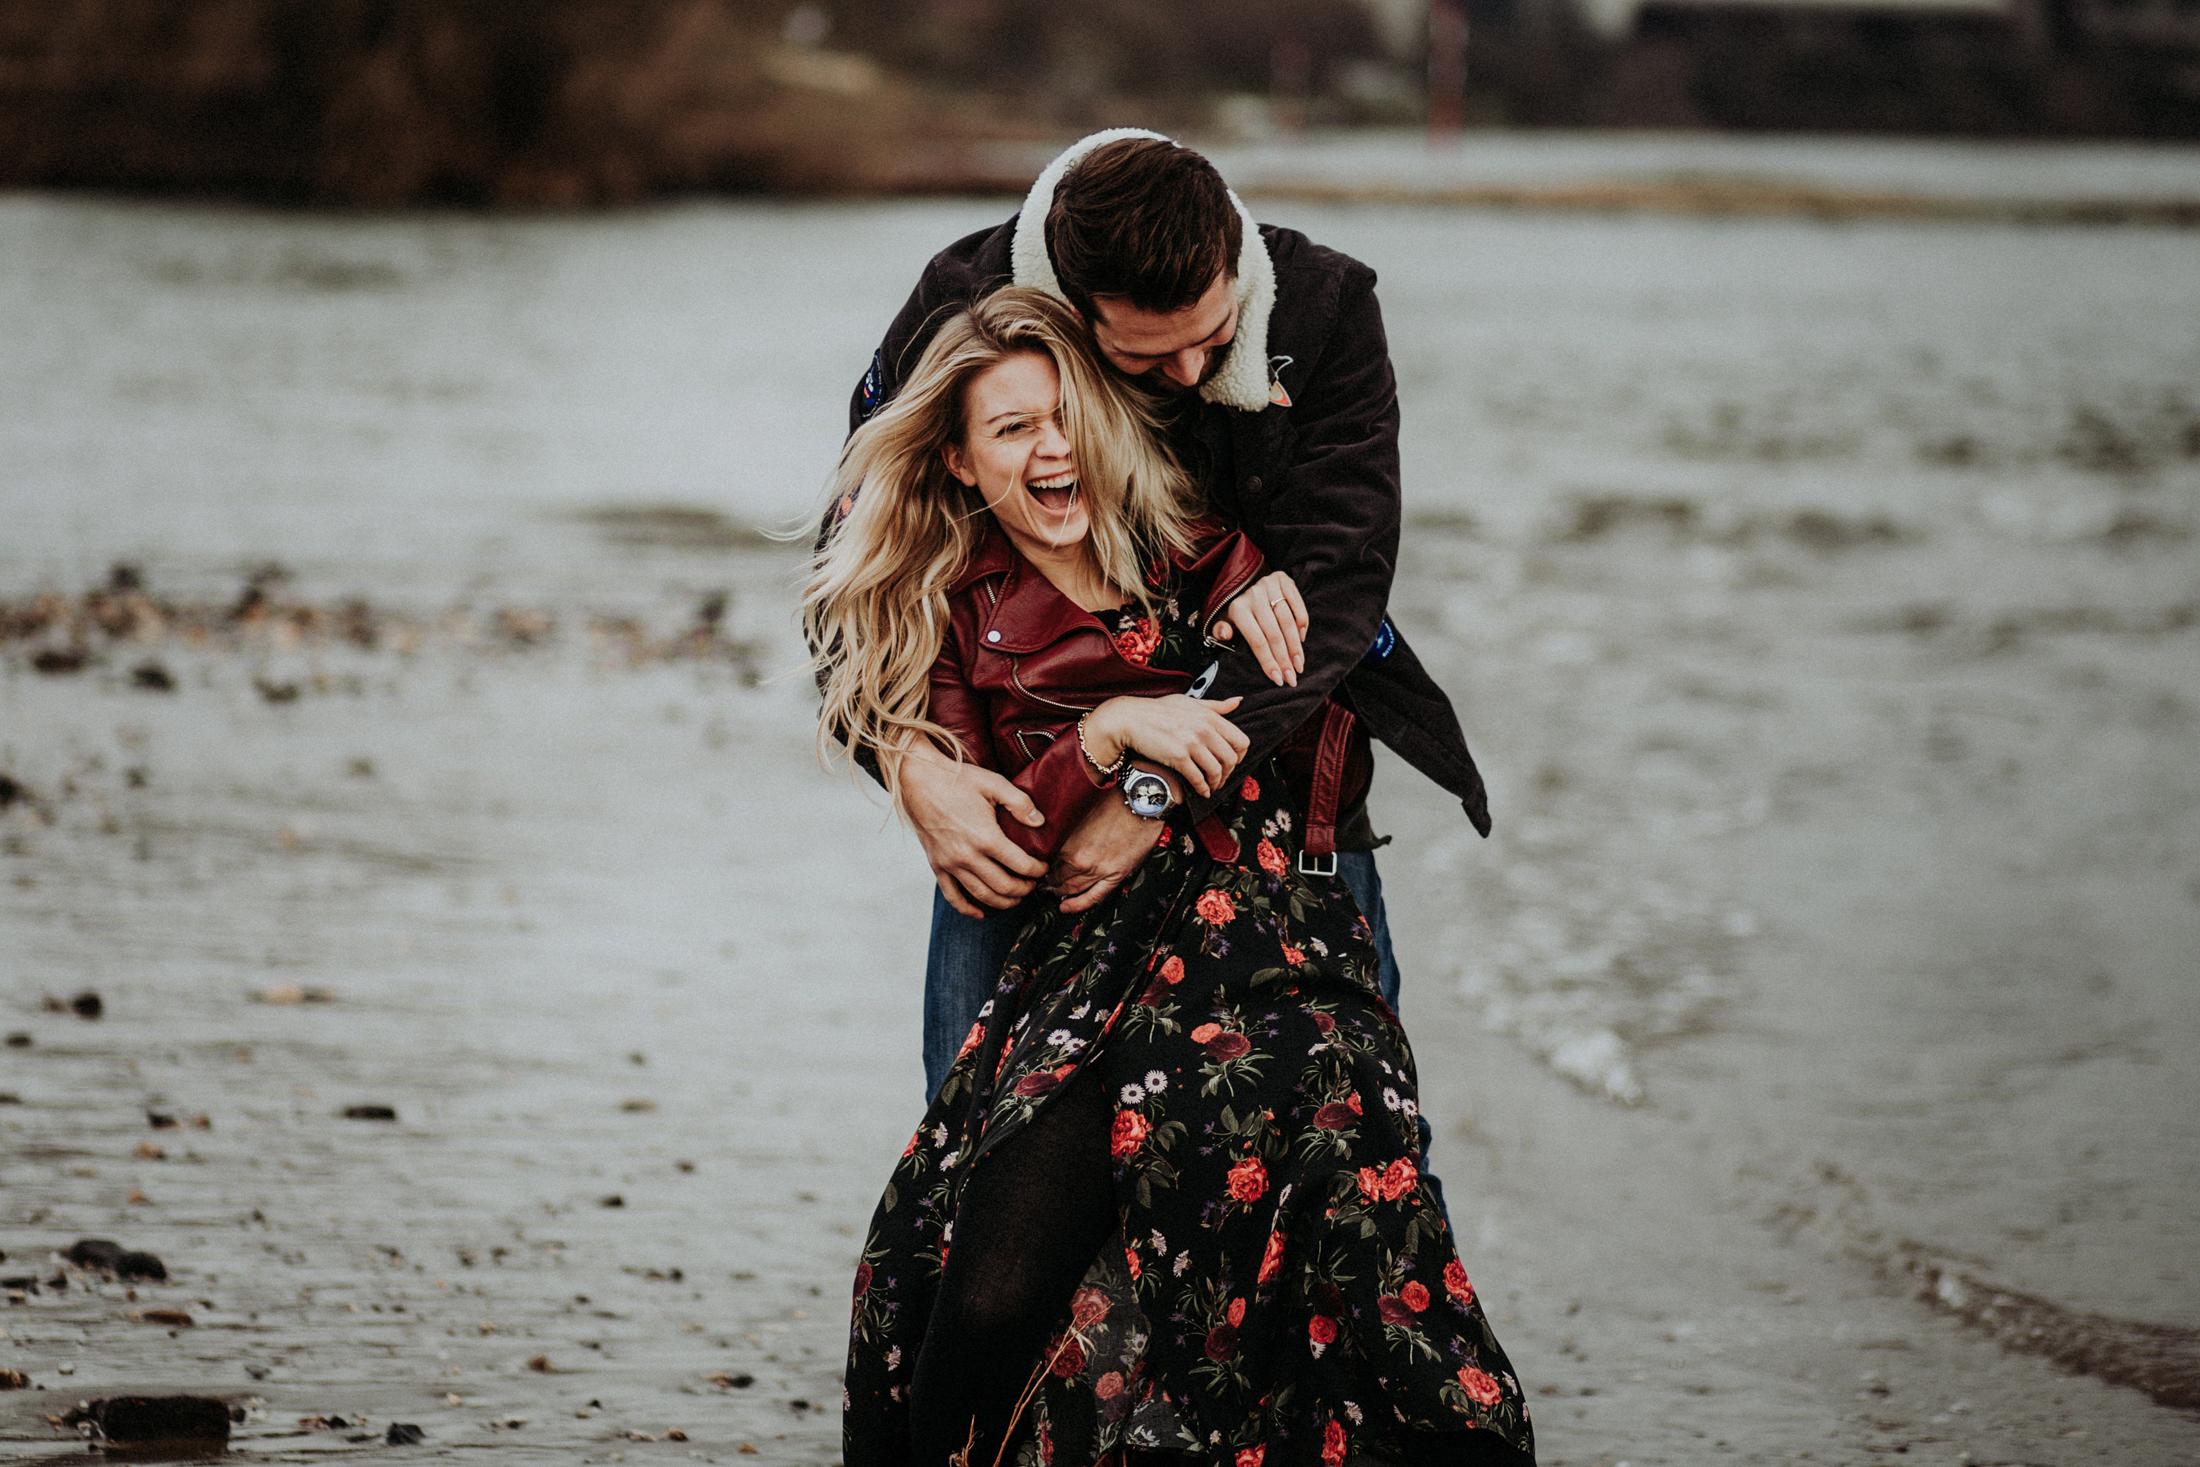 Wedding_Photographer_Mallorca_DanielaMarquardt_Photography_CanaryIslands_Lanzarote_Iceland_Tuscany_Santorini_Portugal_NewYork_Spain_Elopement_Hochzeitsfotograf_CK52